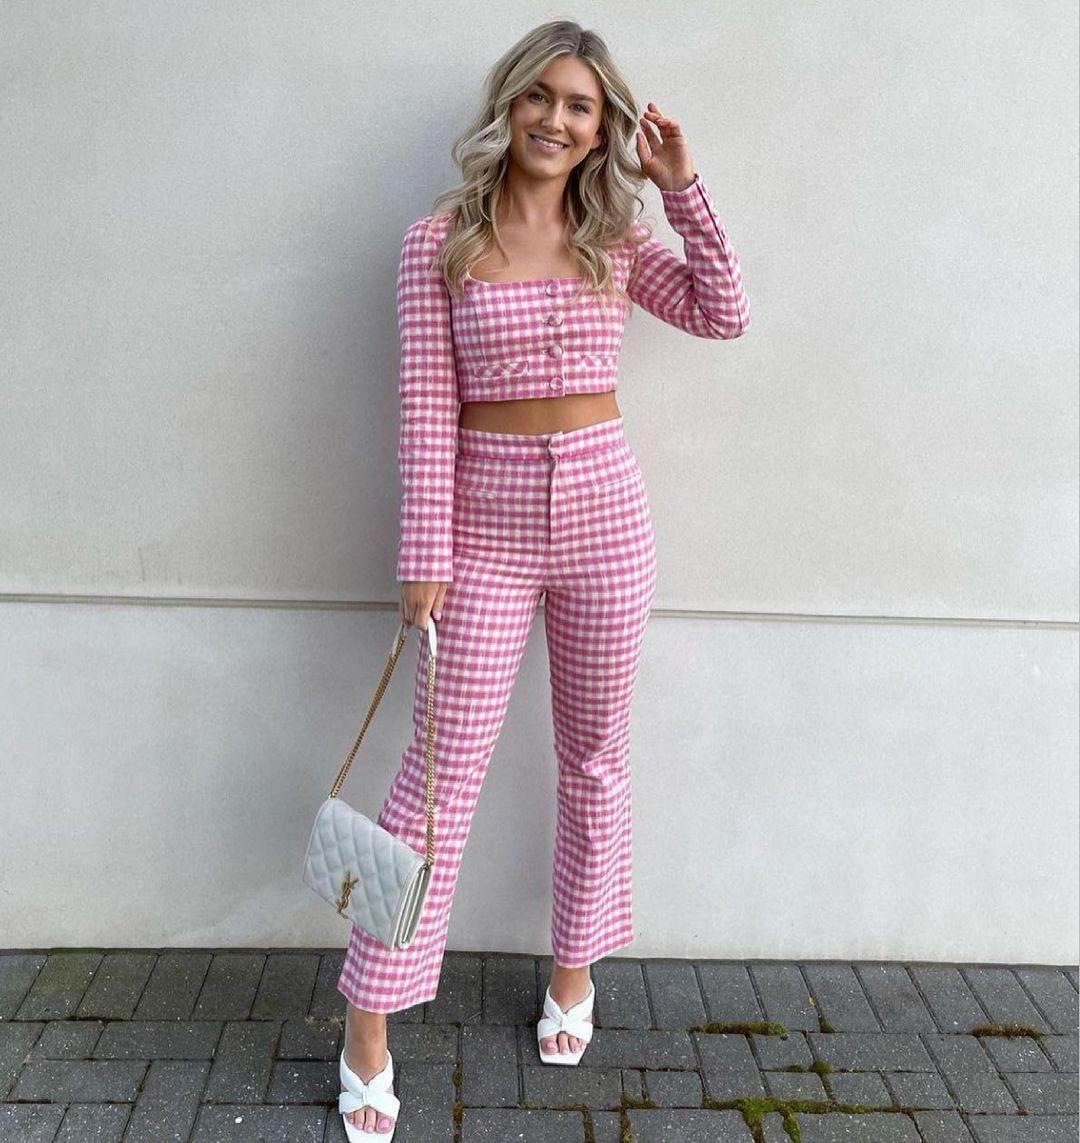 gingham plaid mini flare pants de Zara sur zara.style.daily